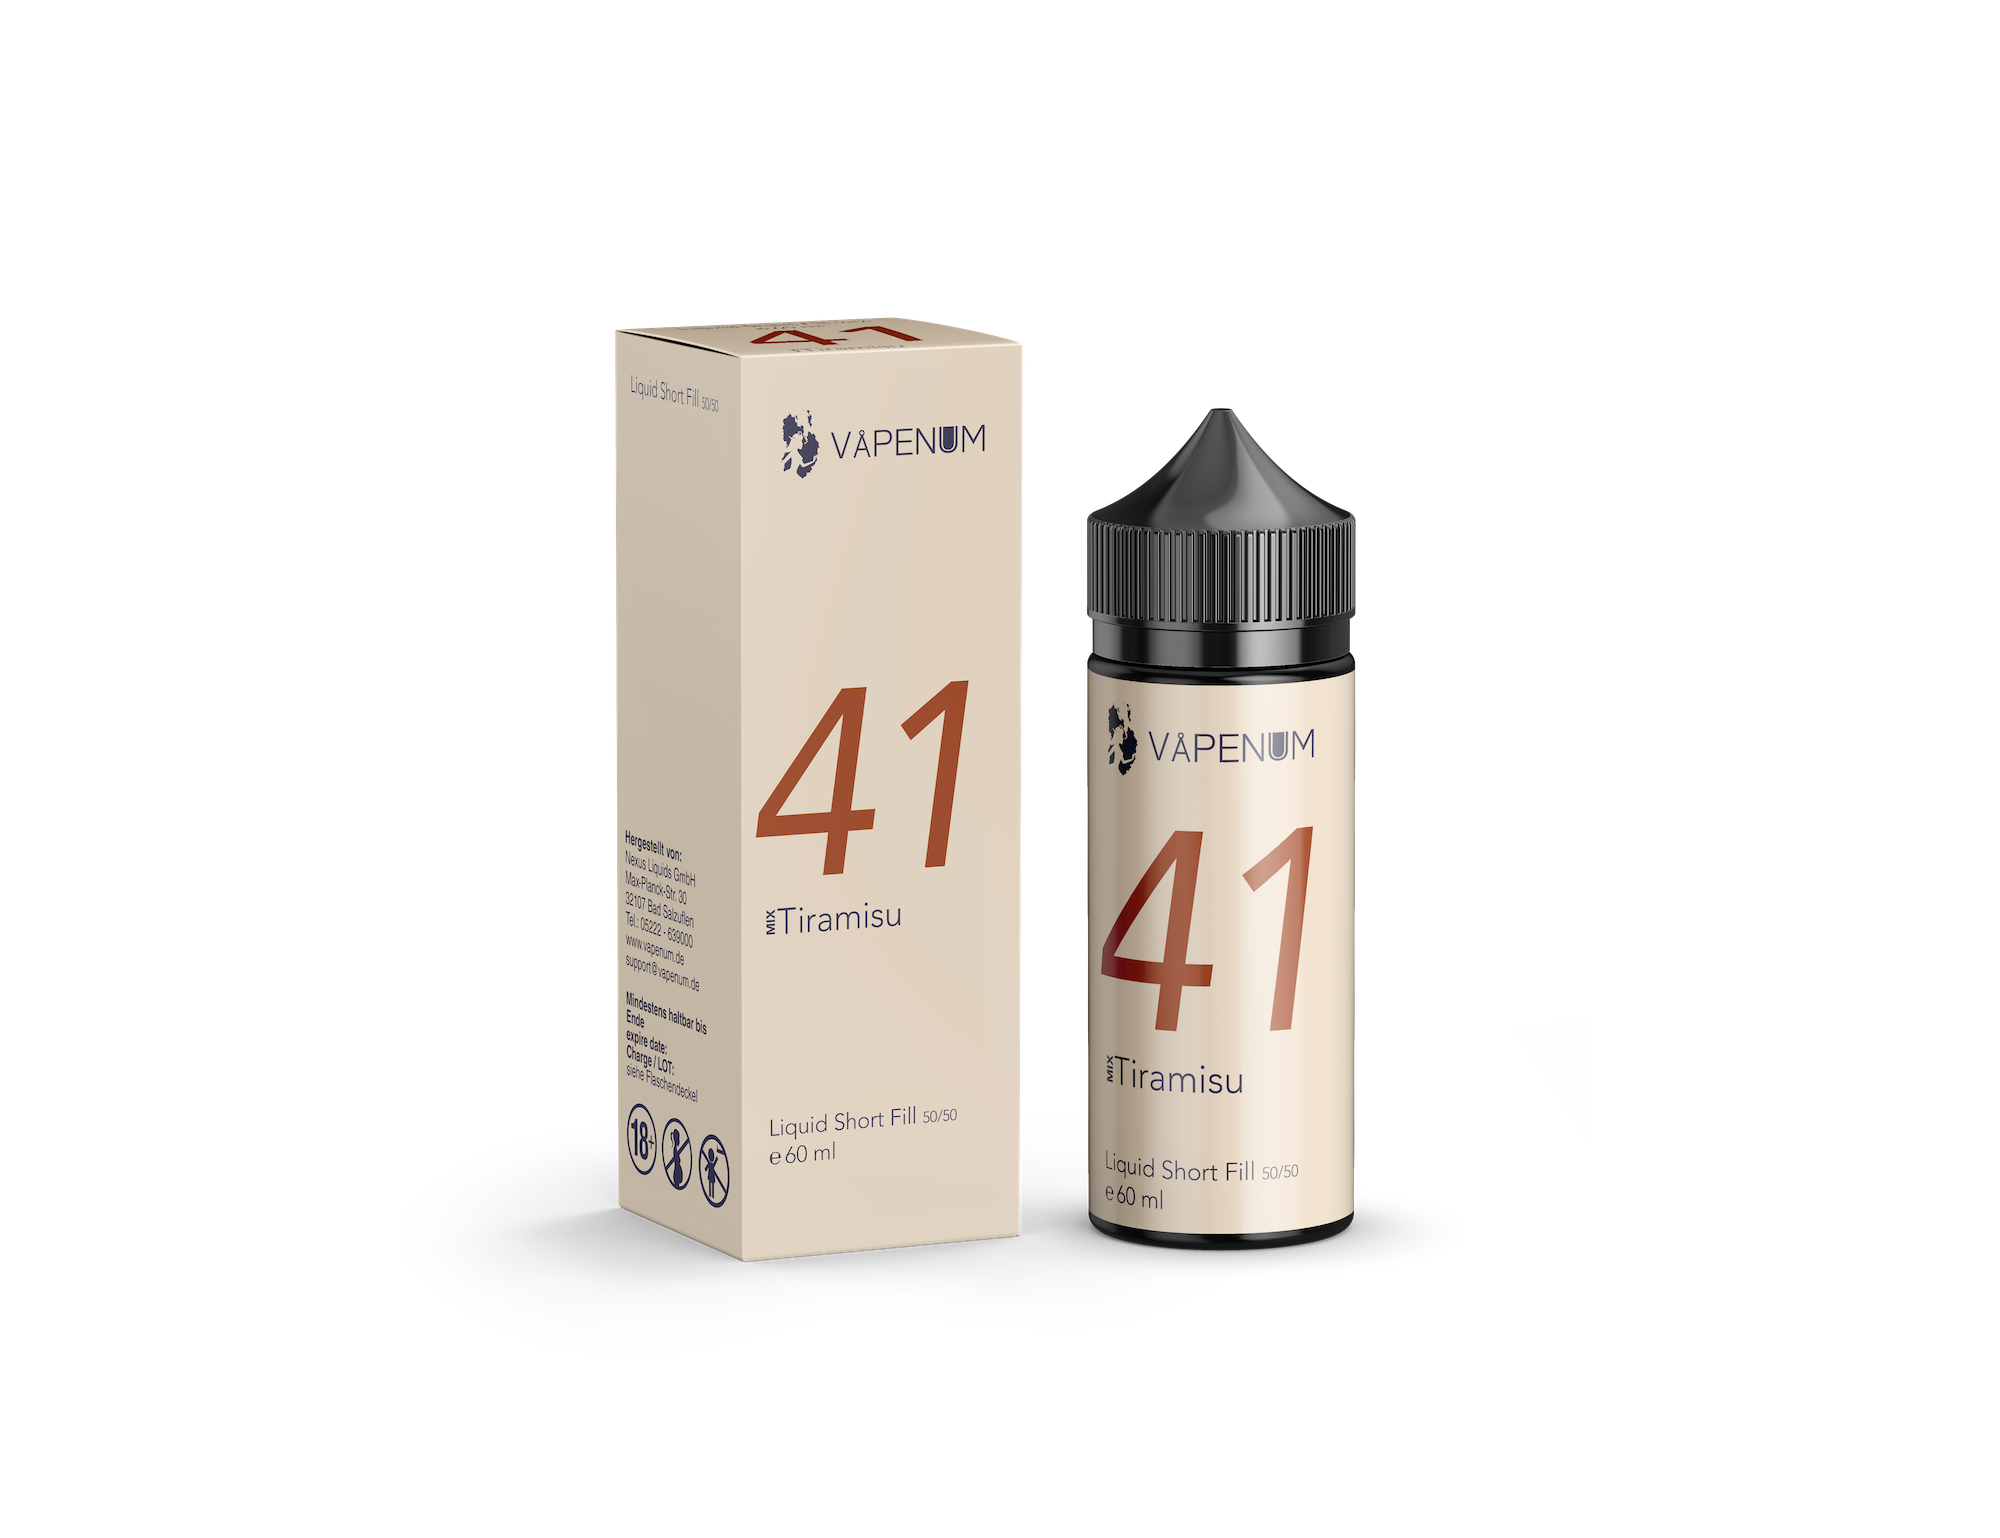 Vapenum Shortfill Mix 41 Tiramisu